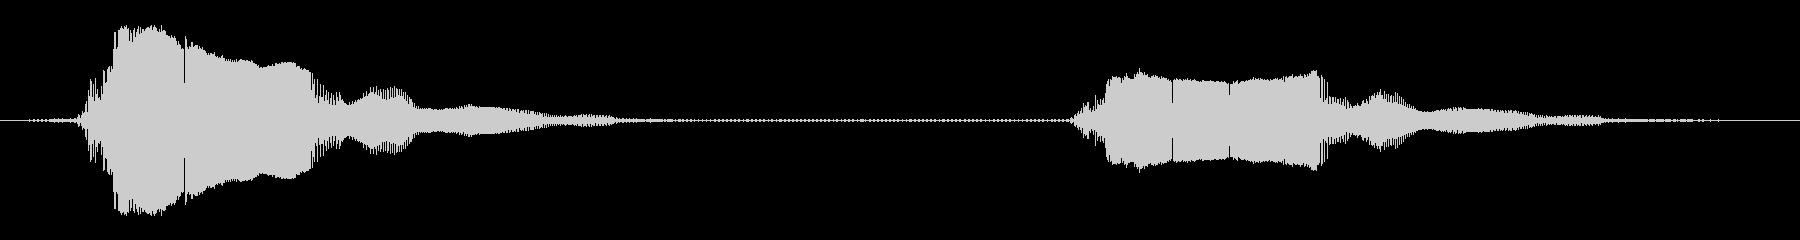 Integra、2つのクローズアッ...の未再生の波形